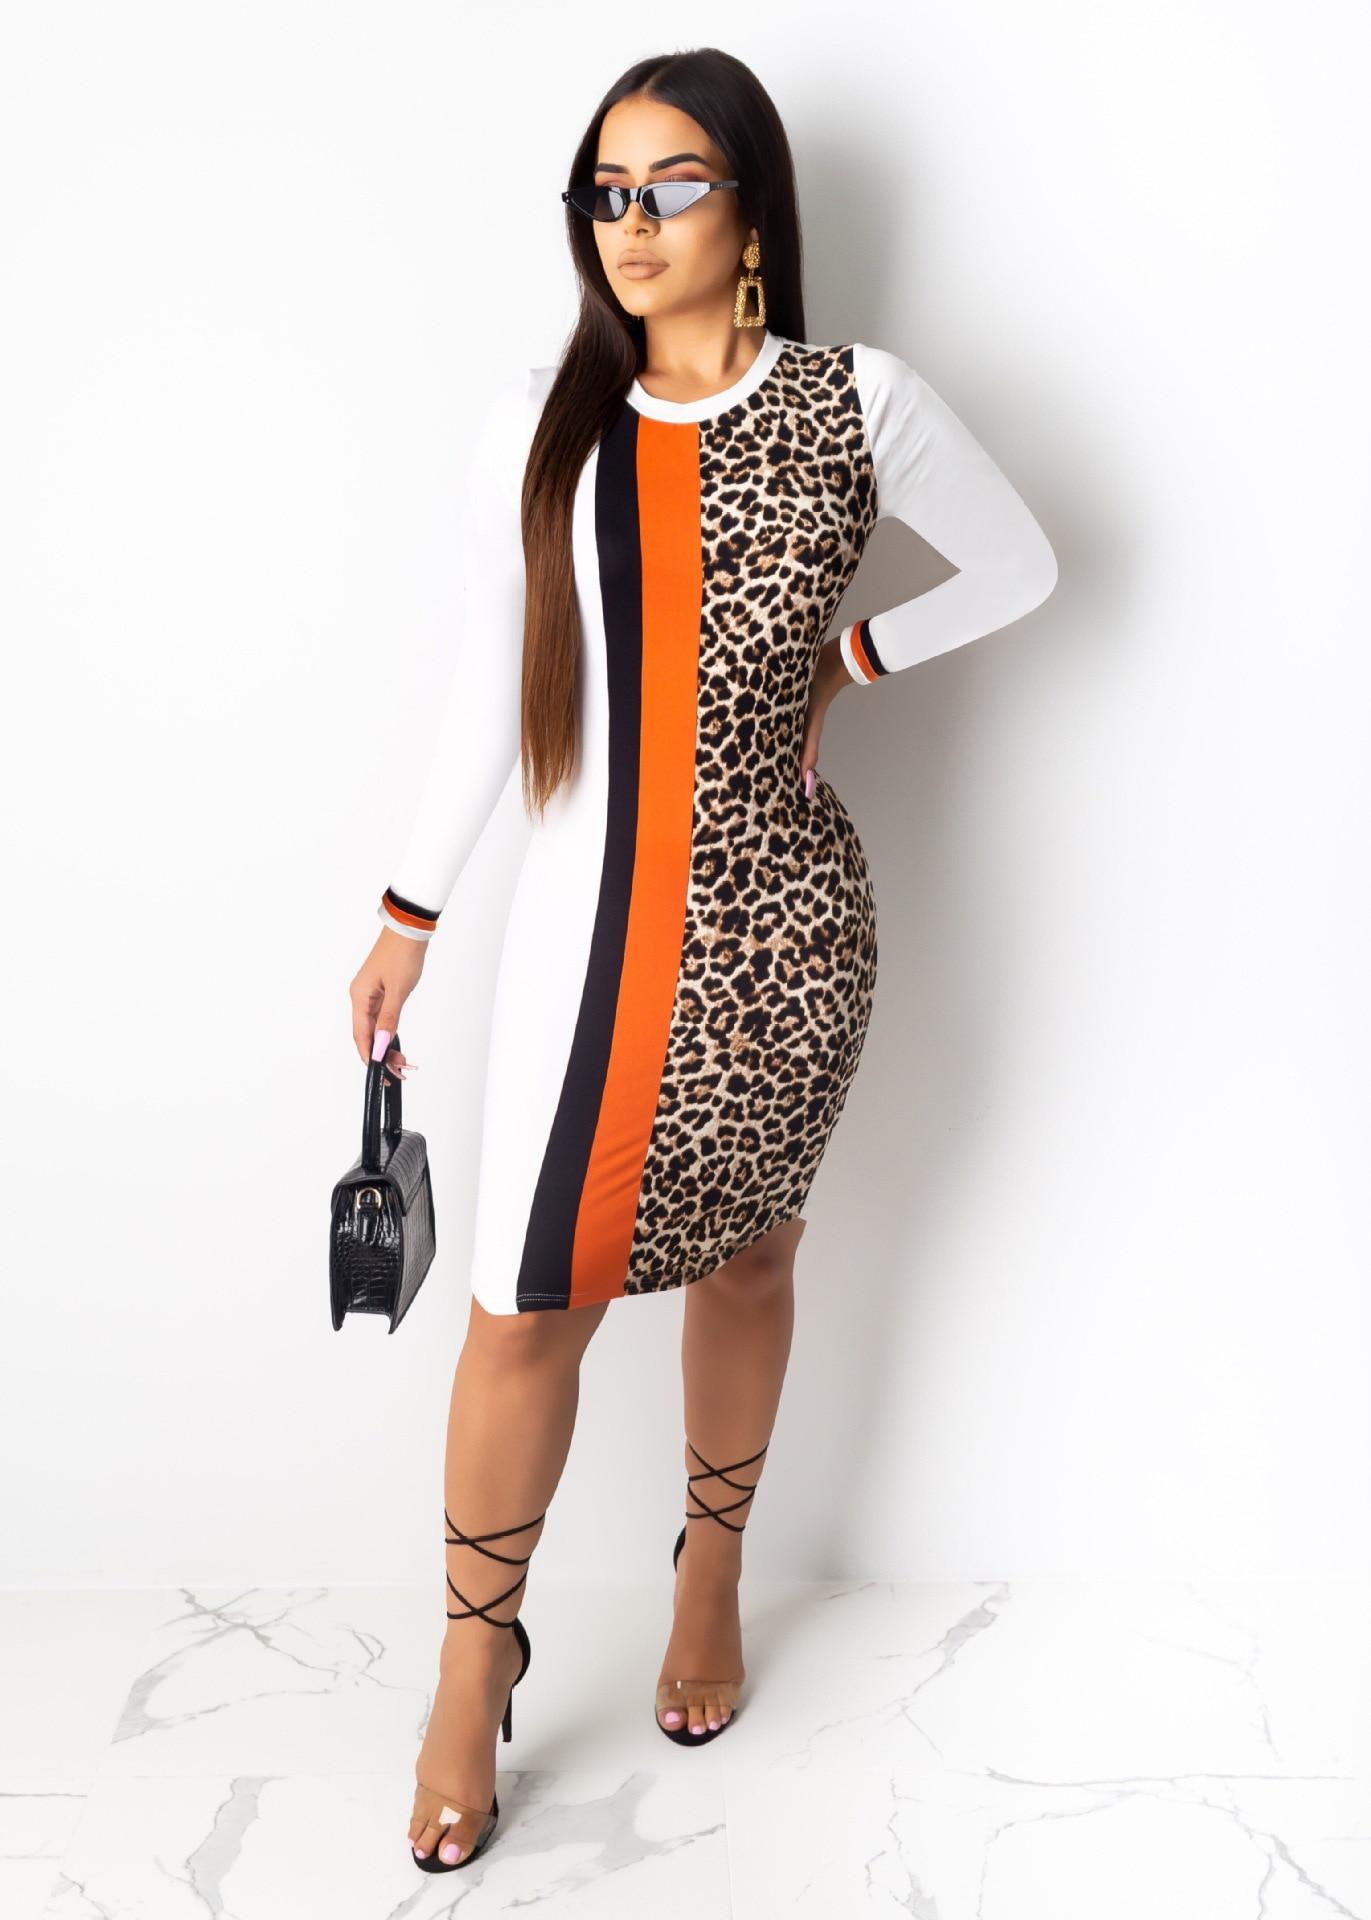 African Dashiki Sexy Bodycon Party Women Long Sleeve Leopard Print Autumn Sheath Elegant Autumn Mini Dress Vestidos Robe Femme